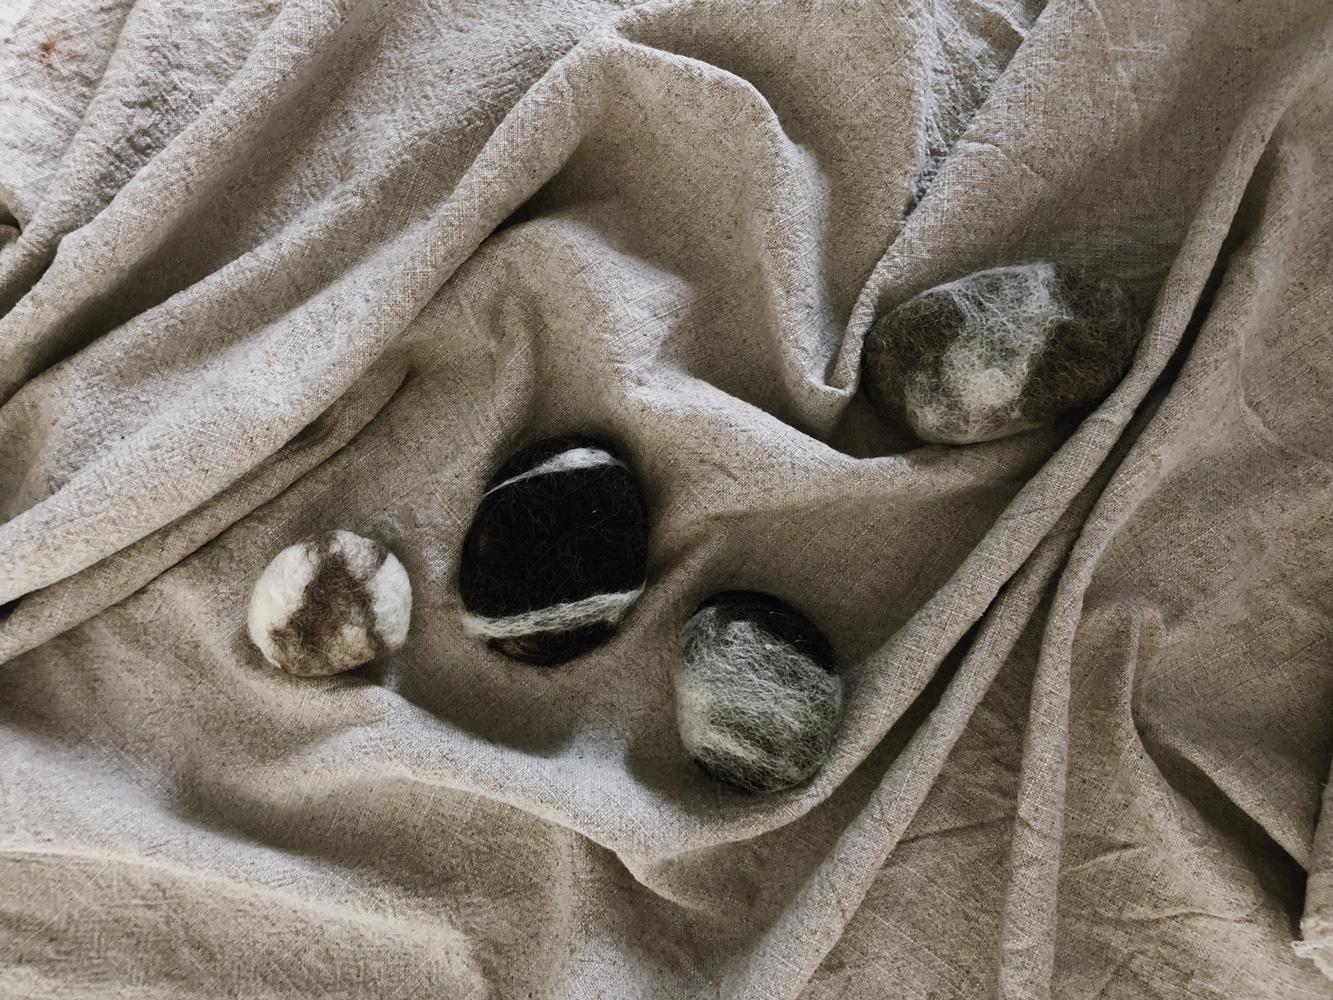 Seife umfilzen filzen Stein Maerchenwolle FLusskiesel Filzwolle Naßfilzen Flatlay Titel - Flusskiesel | Seife umfilzen